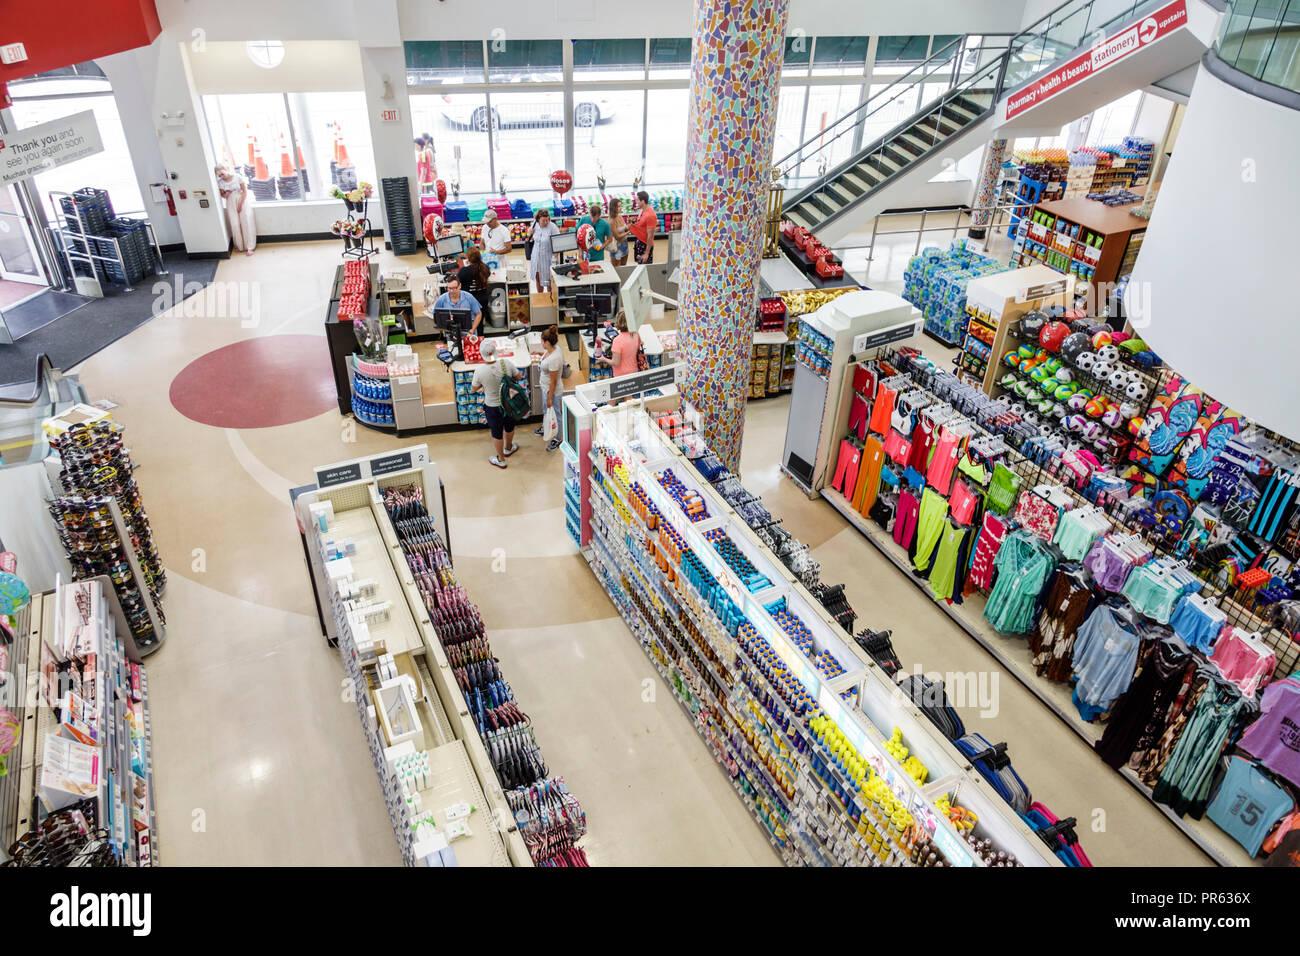 Miami Beach Florida Walgreens inside aisles display sale checkout counter cashier - Stock Image